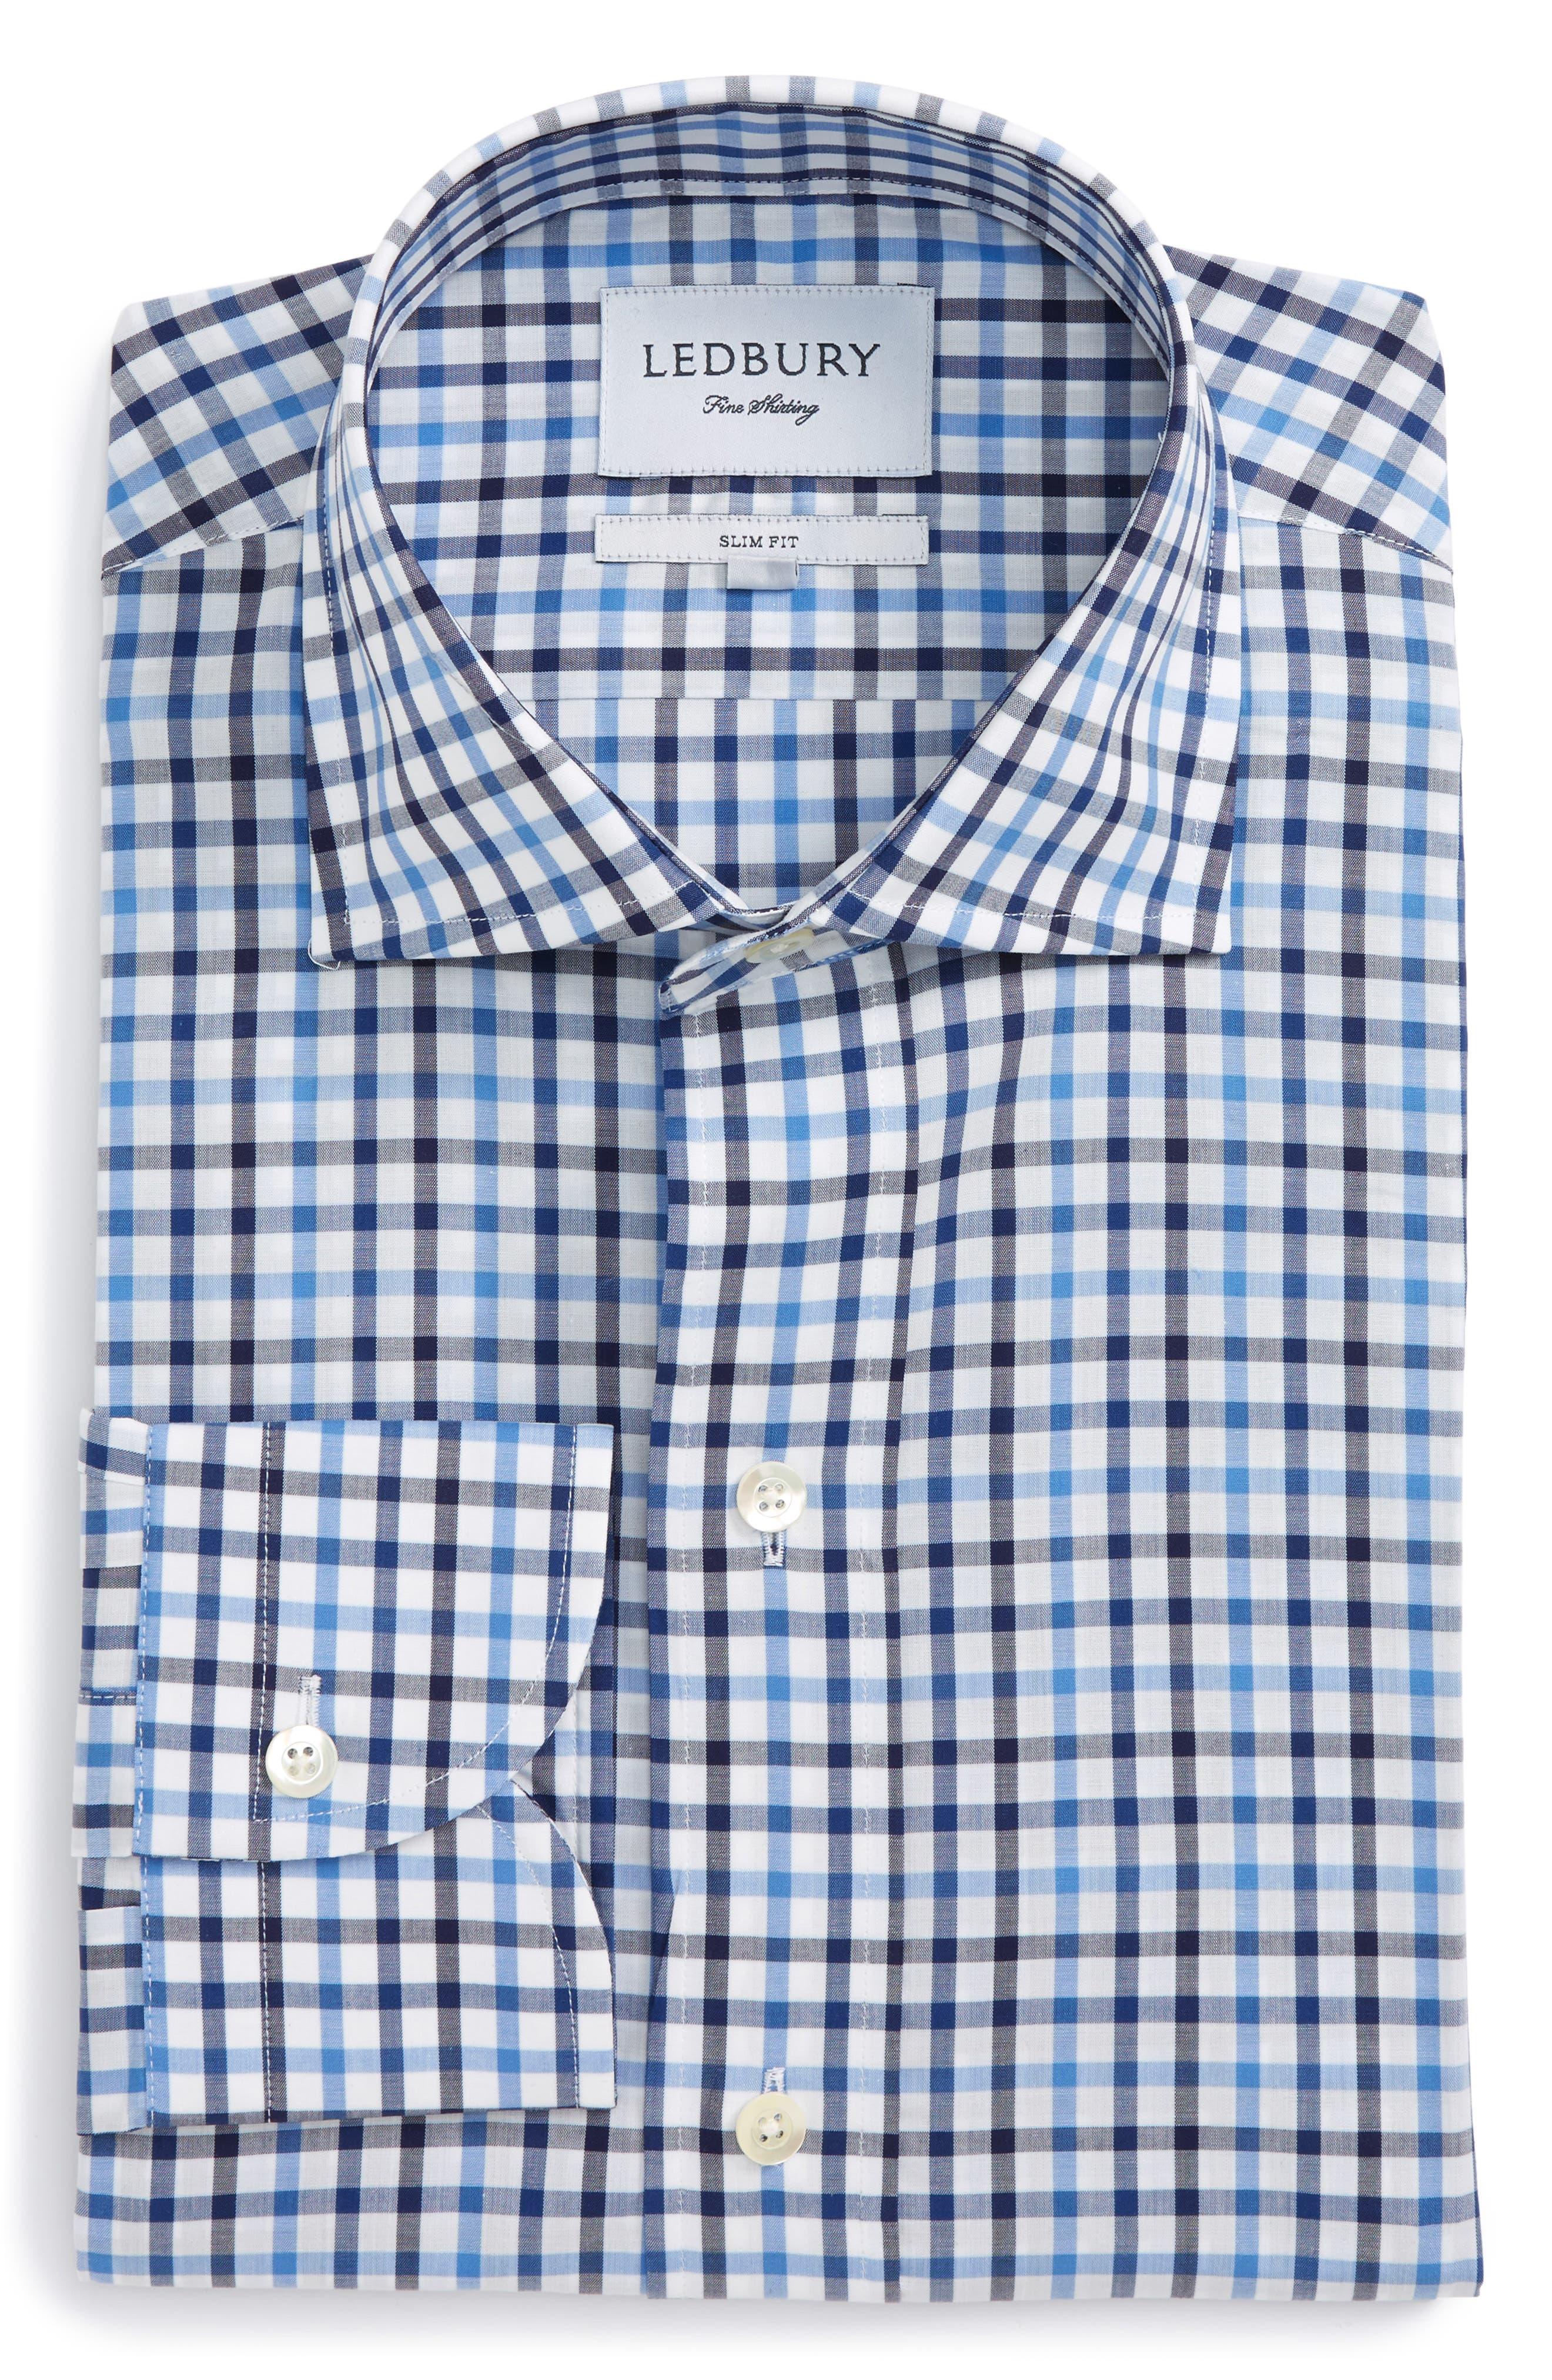 Ledbury The Beecher Slim Fit Gingham Dress Shirt